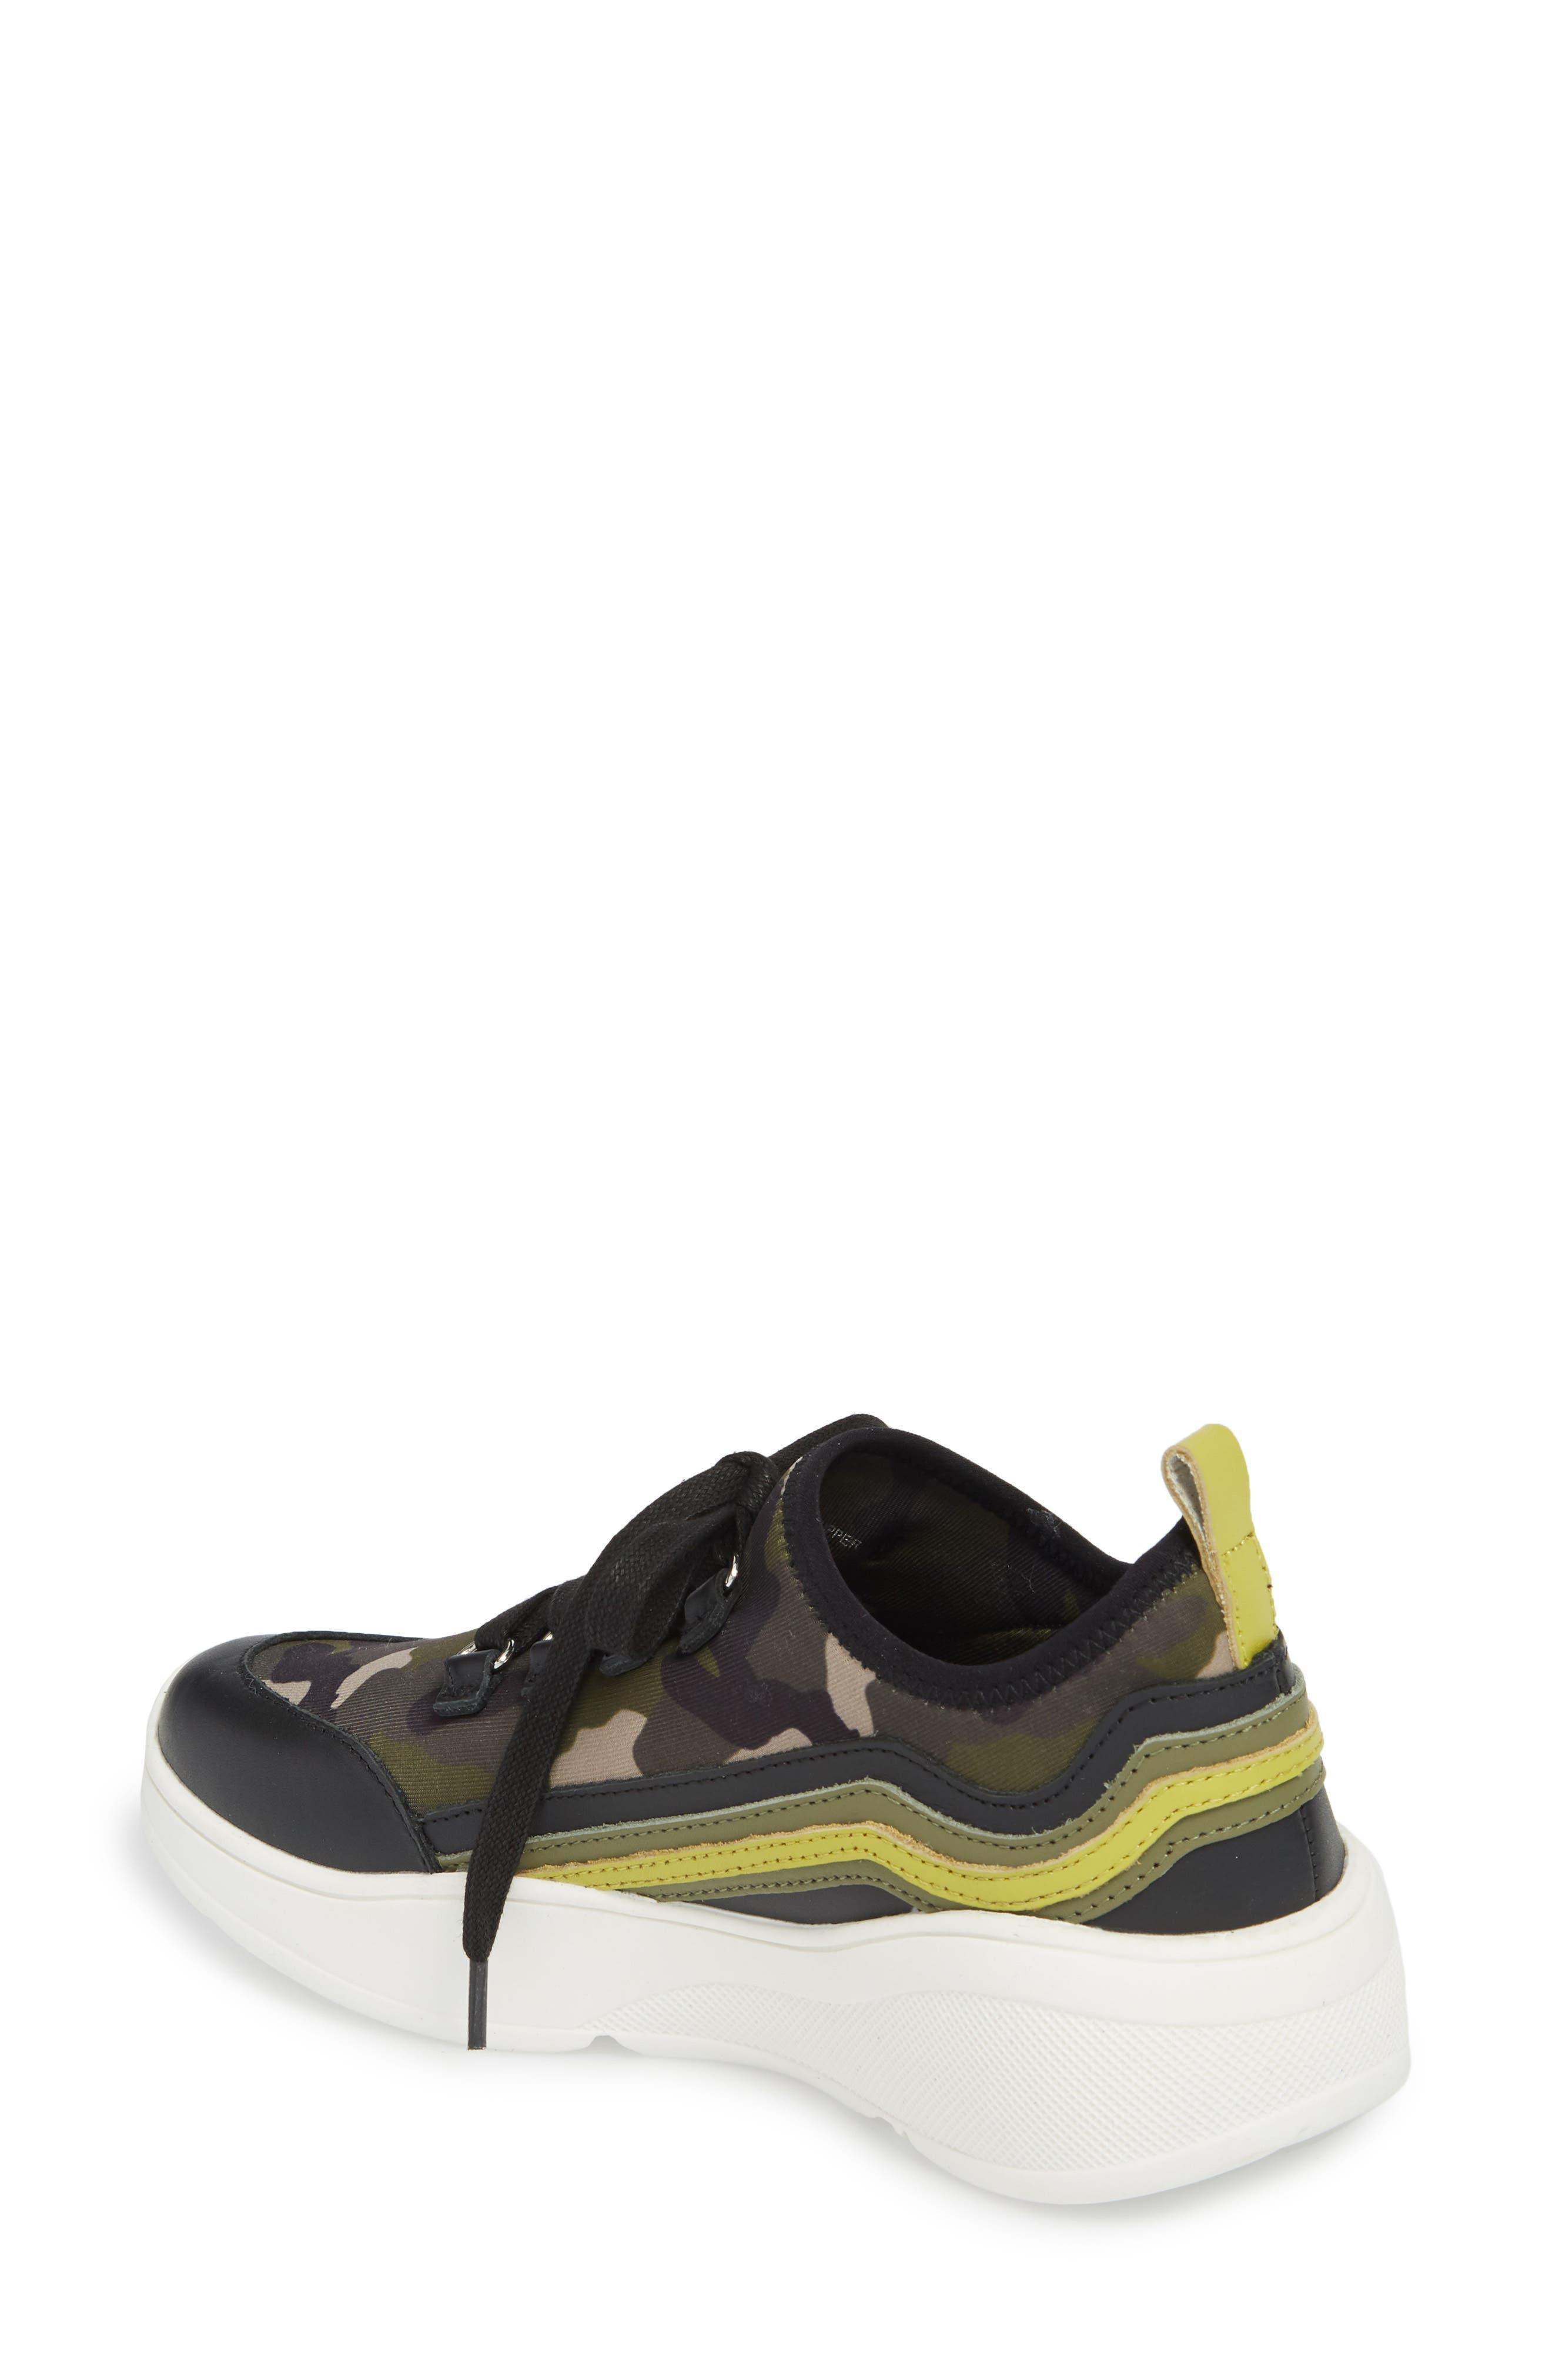 Cavo Rainbow Sneaker,                             Alternate thumbnail 2, color,                             Camo Multi